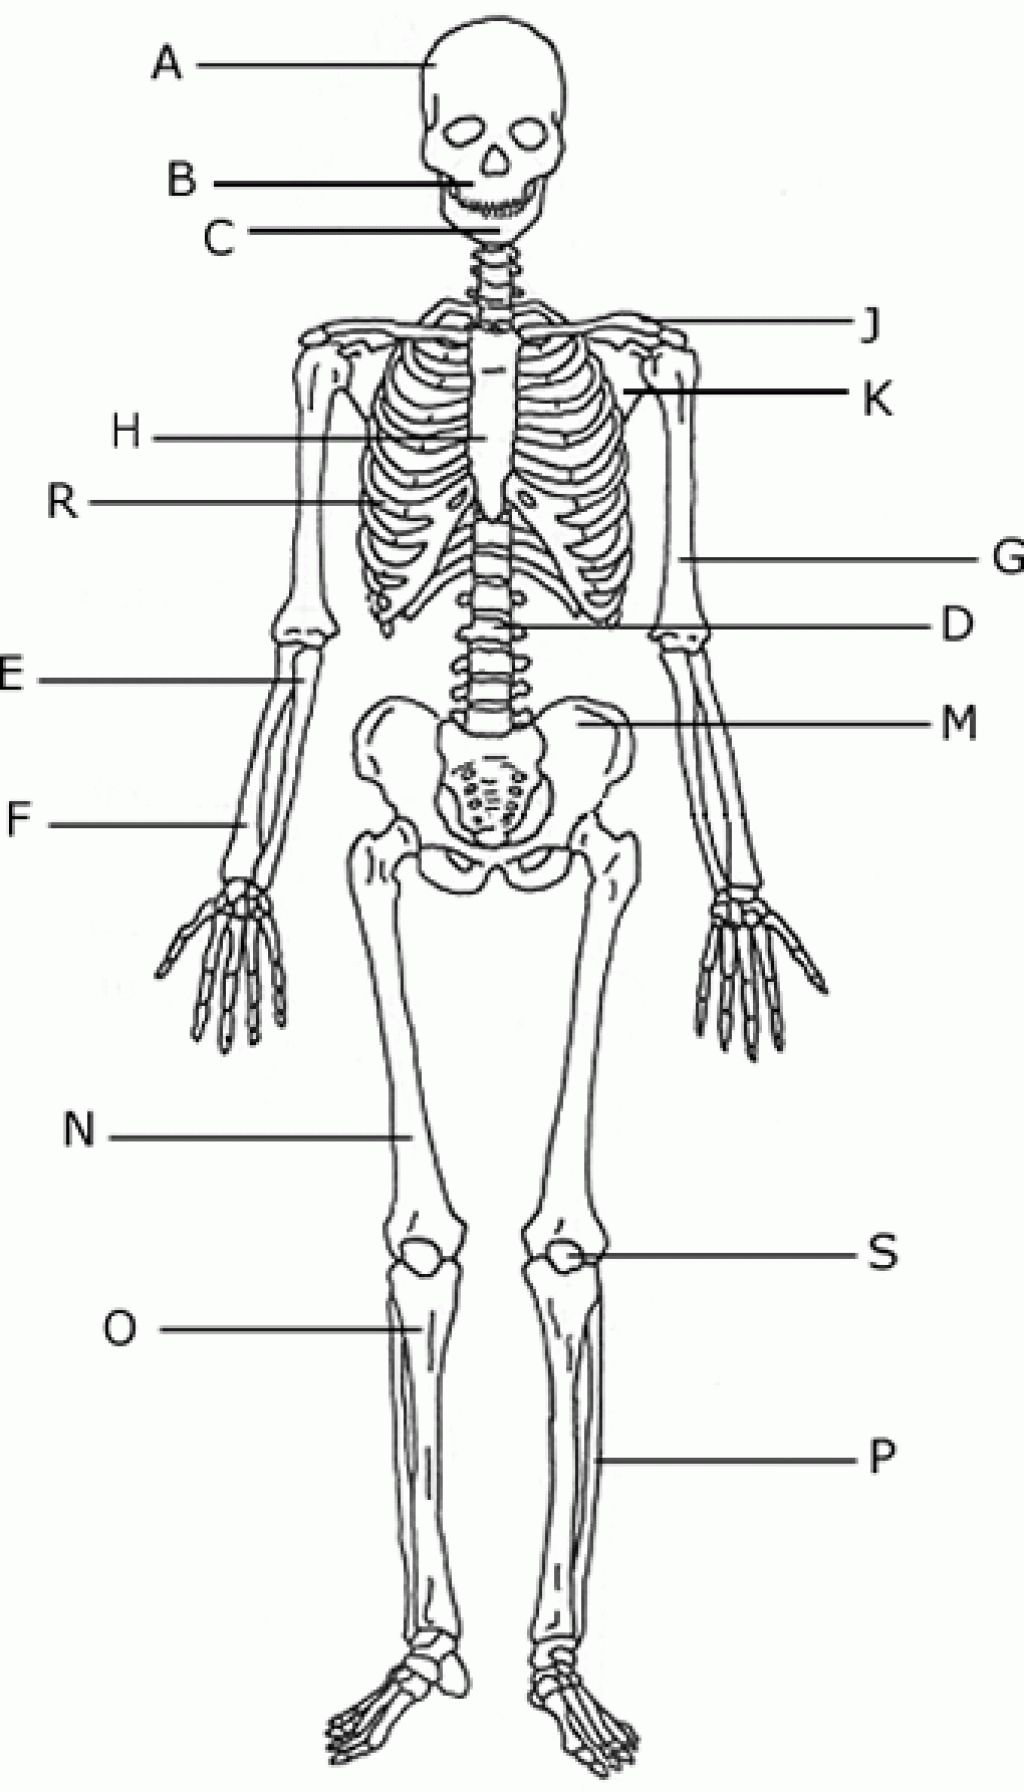 medium resolution of unlabeled diagram of the human skeleton unlabeled diagram of the human skeleton system skeletal anatomy